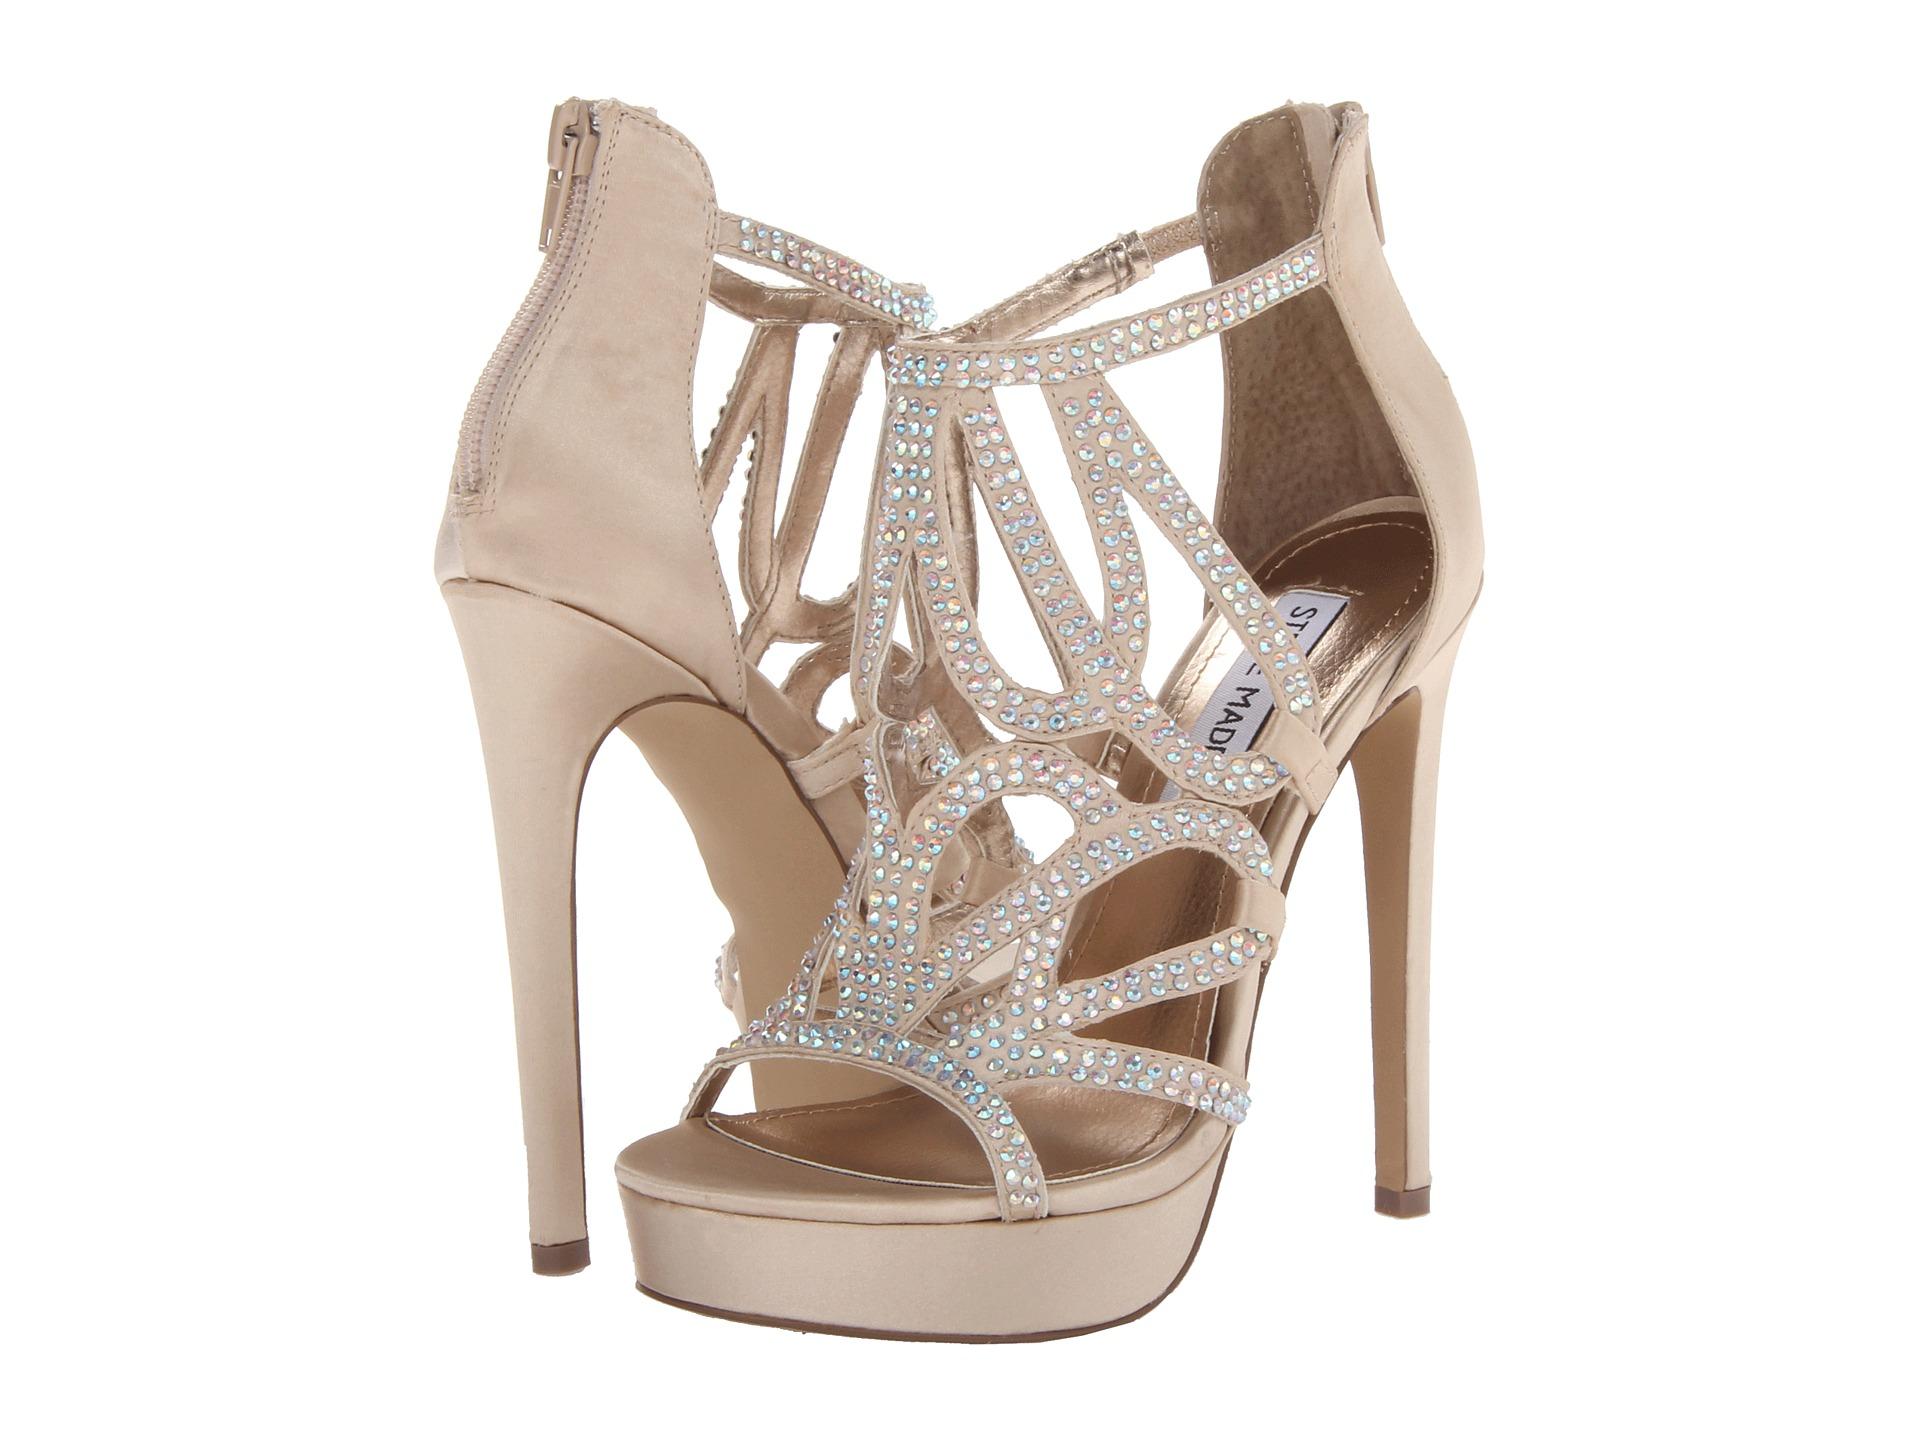 Bridal shoes steve madden – Your wedding moments blog